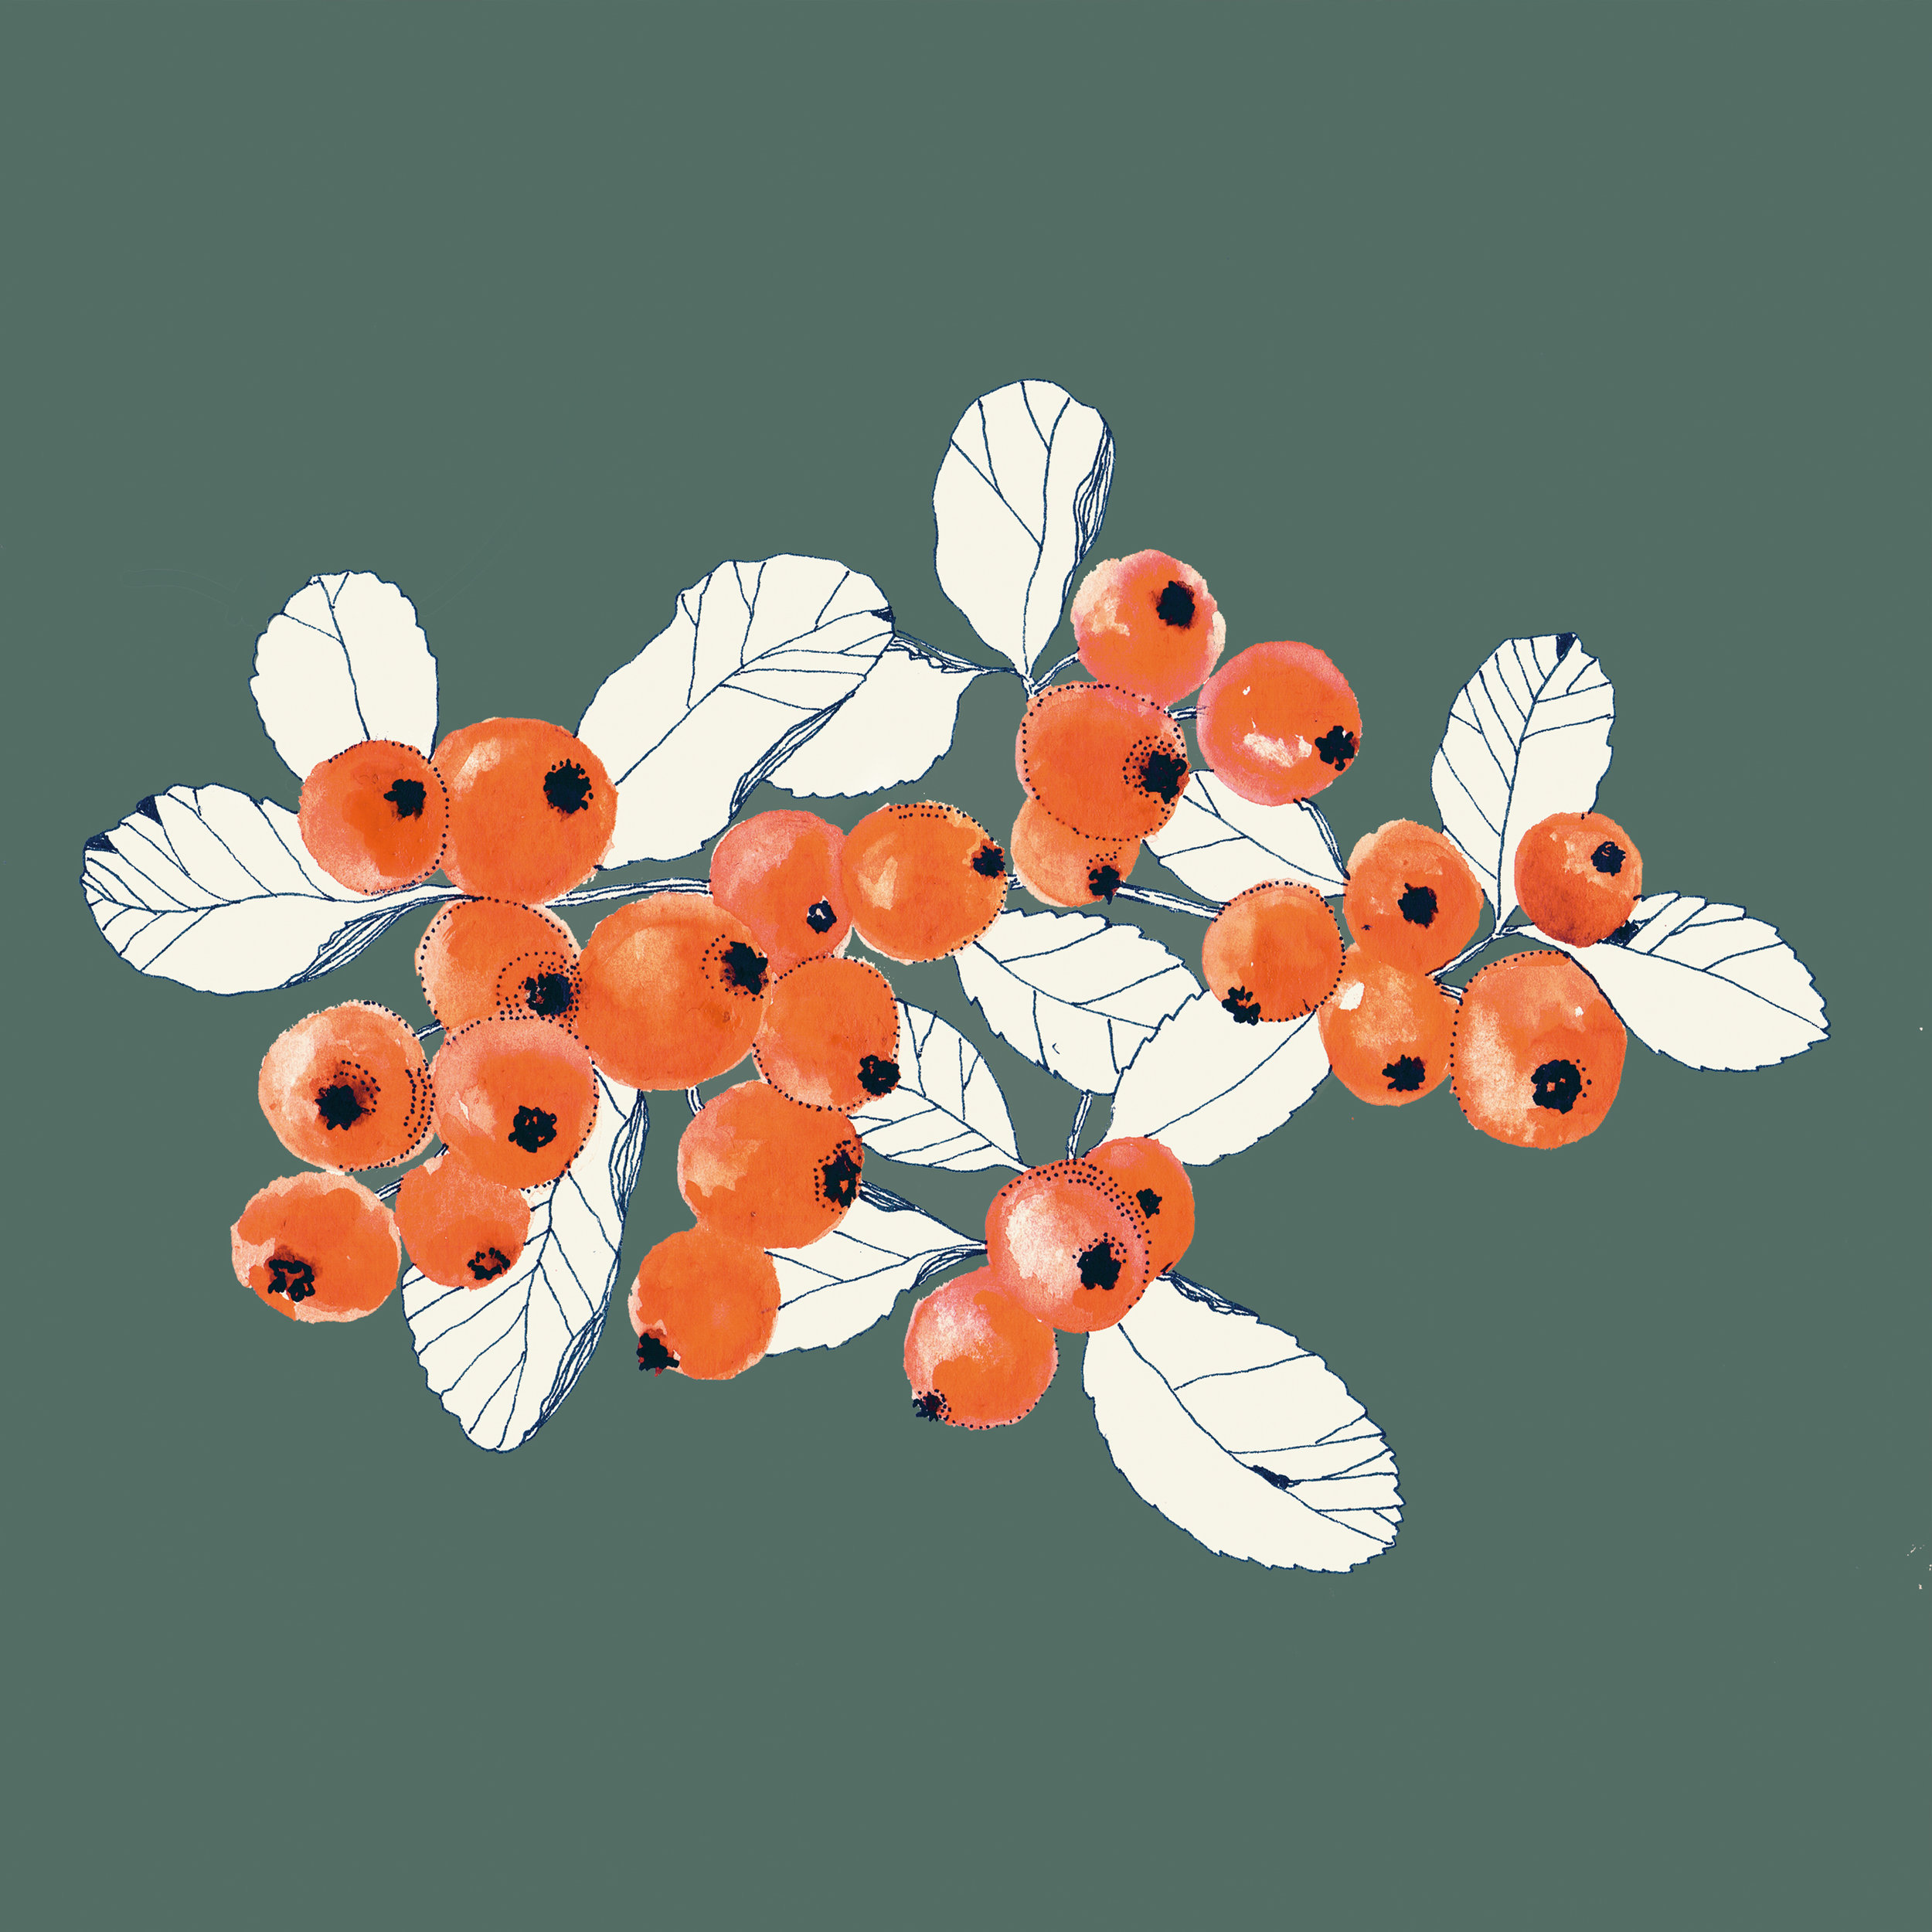 berries-studiokryszewski.jpg